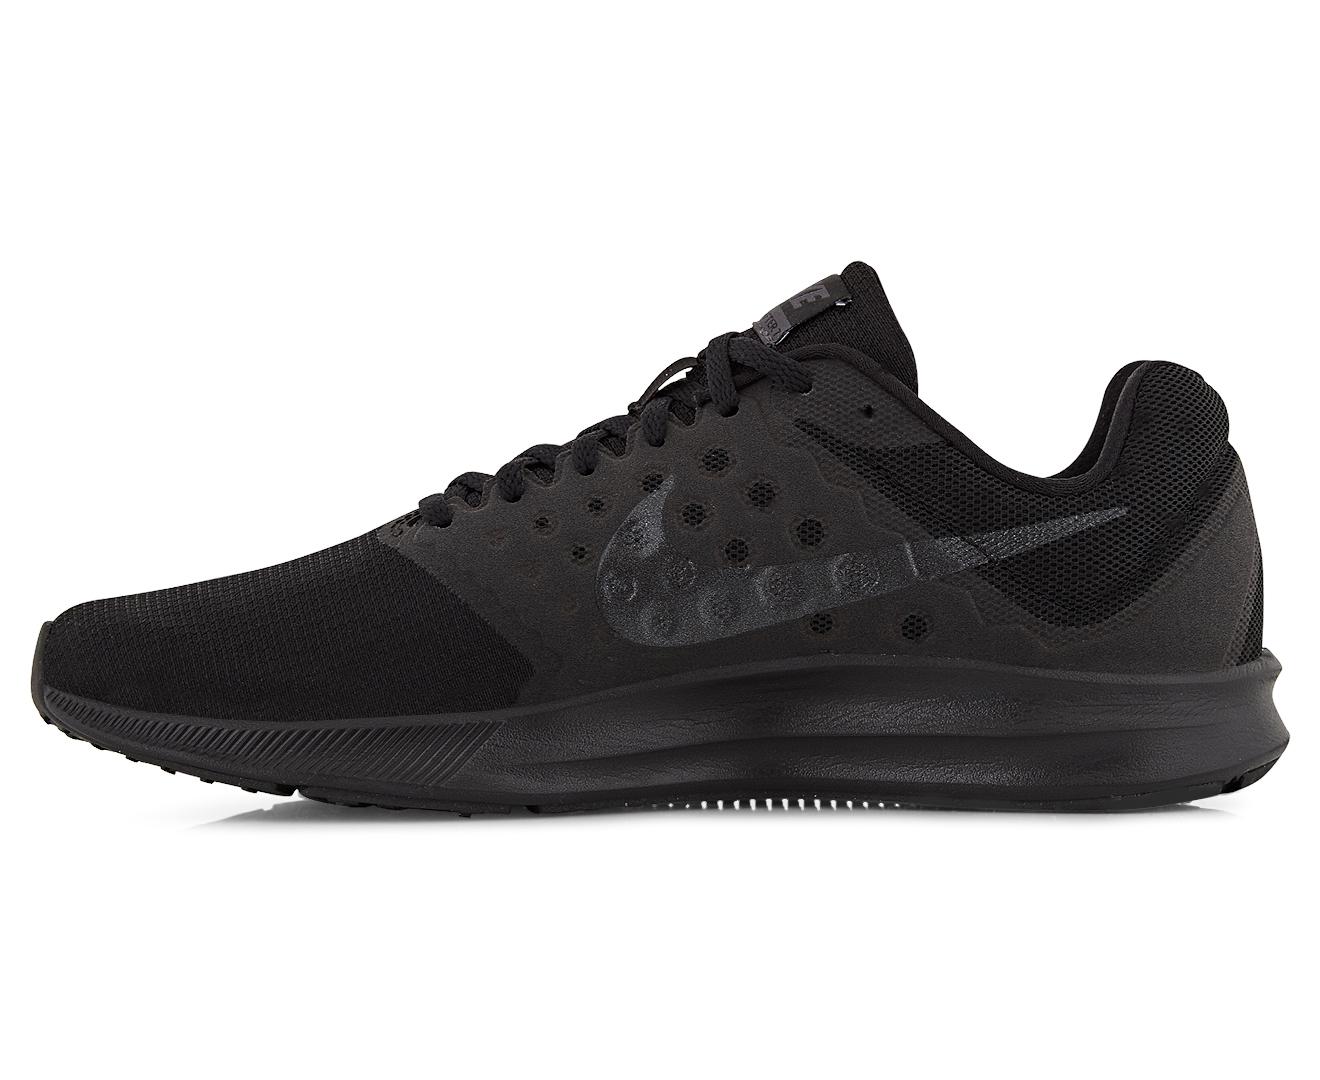 87f85267801 Nike Men s Downshifter 7 Shoe - Black Metallic Hematite-Anthracite ...